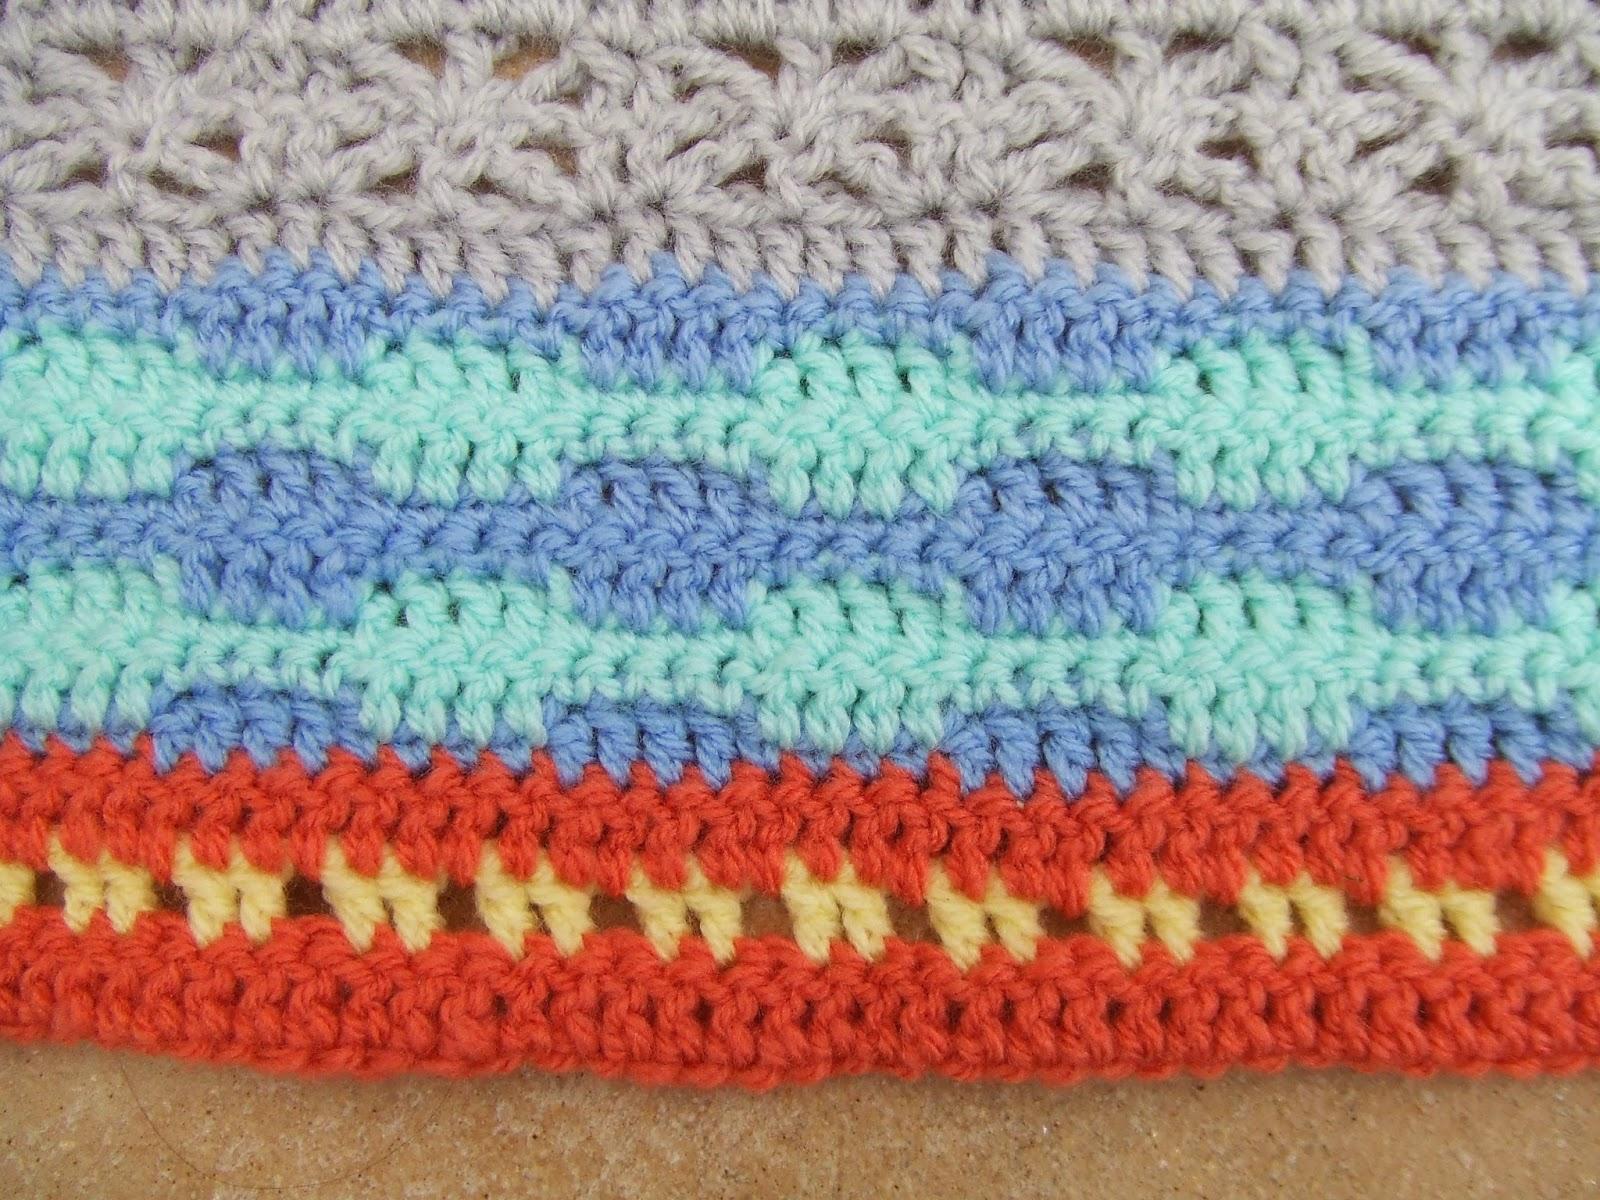 My world of crochet: August 2014